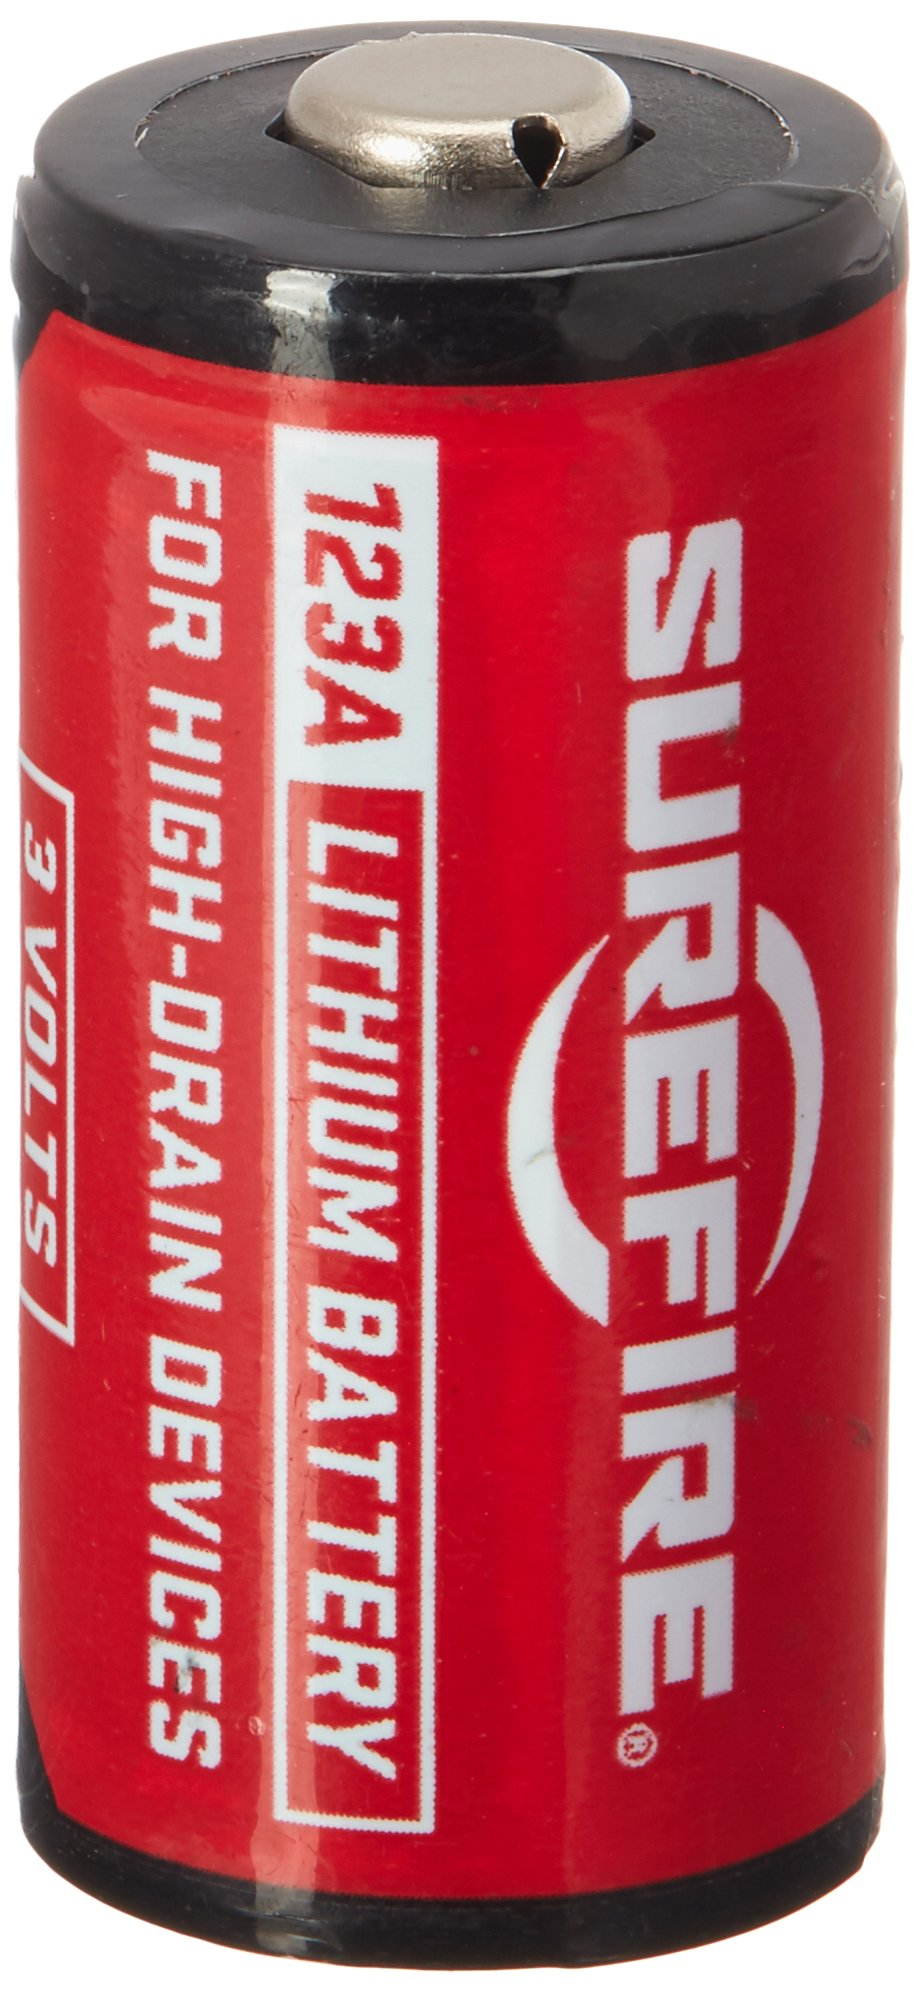 SureFire 1644126Surefire 82013 - SF123A 3 Volt Lithium Battery (12 Pack) (SF12BB SF123A 12PK)